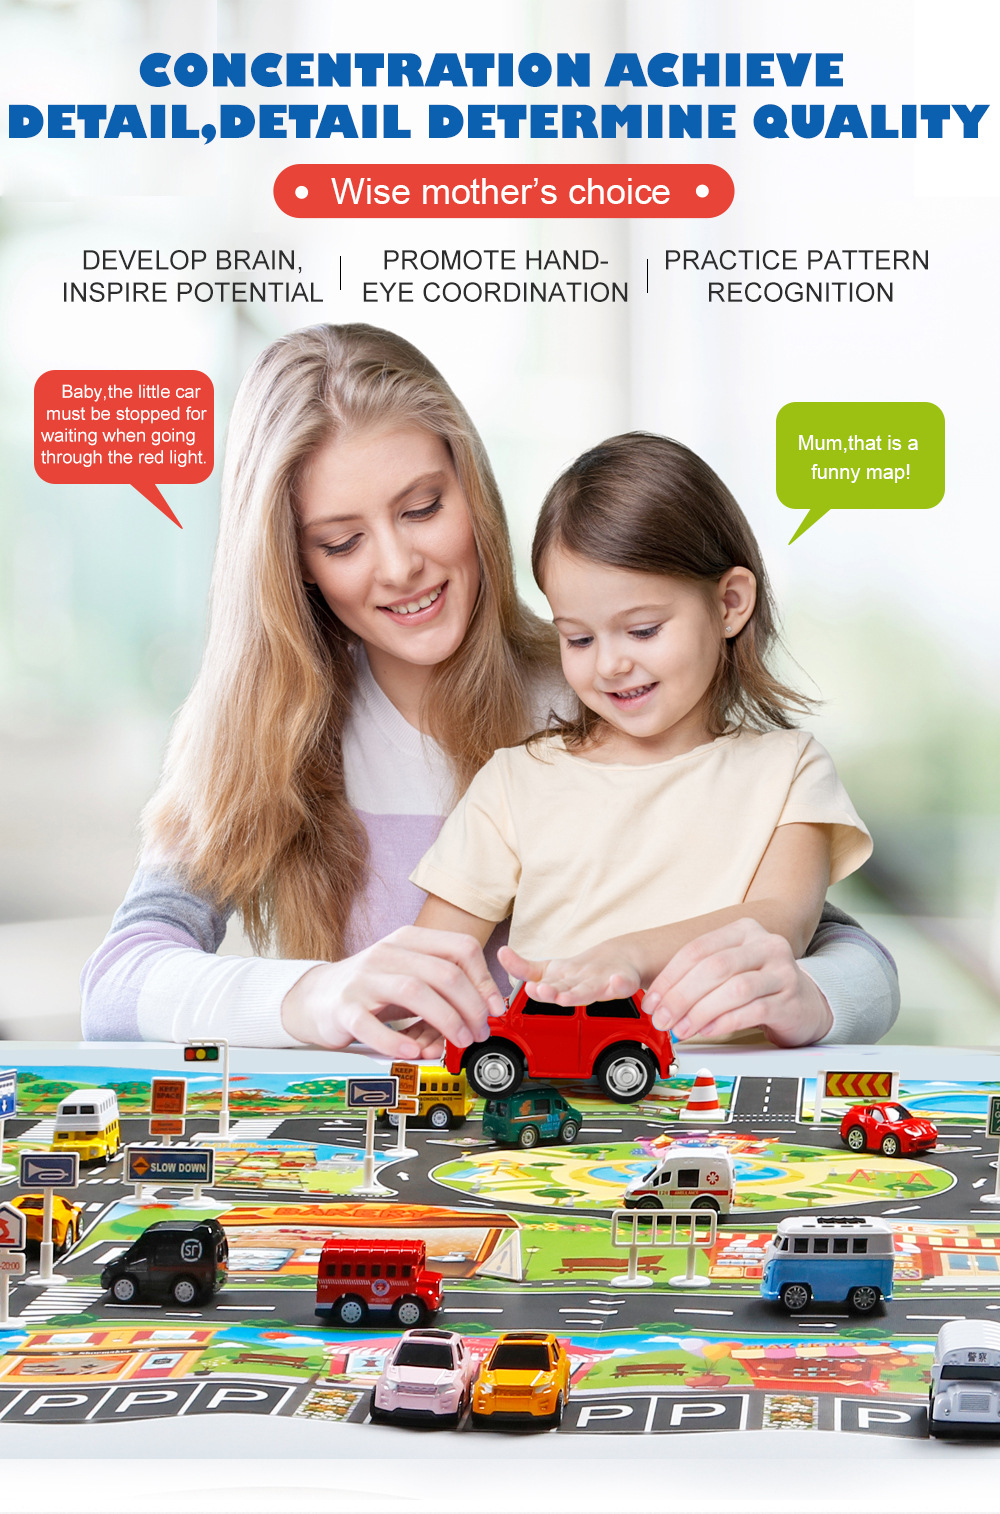 H70ce17d81bc94dc79babb3d0f9d891c8B Large City Traffic Car Park Mat Play Kids Rug Developing Baby Crawling Mat Play Game Mat Toys Children Mat Playmat Puzzles GYH